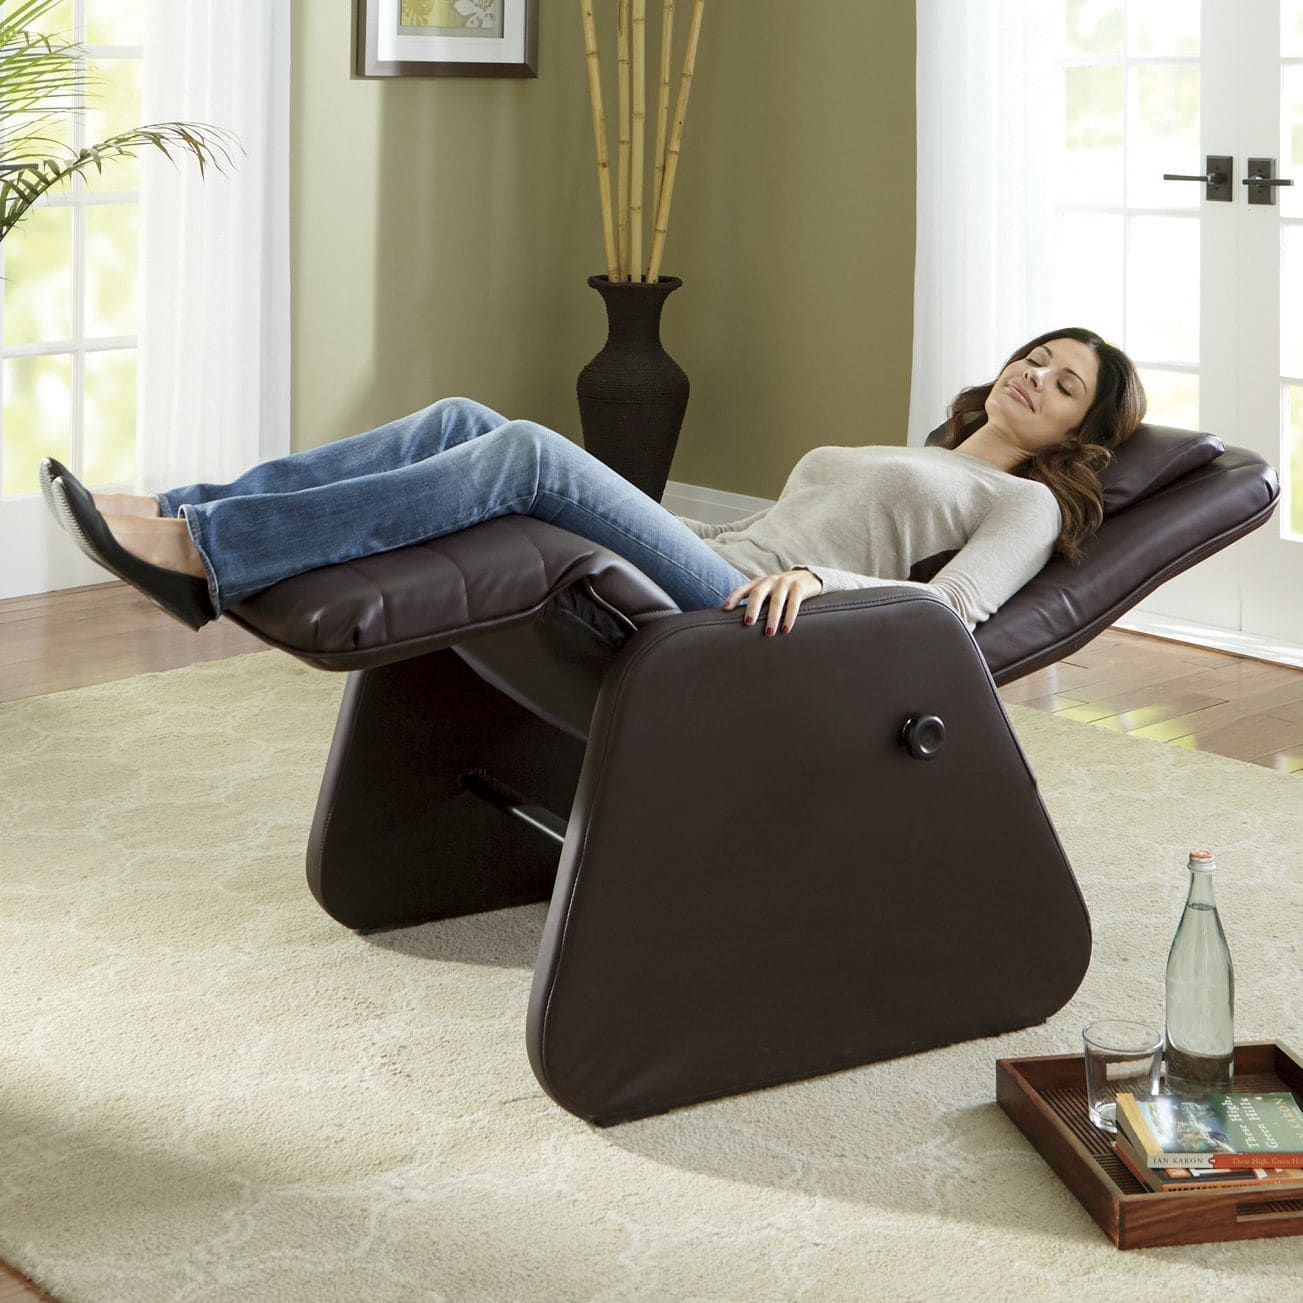 Zero gravity massage chair seventh avenue 2020 리클라이너